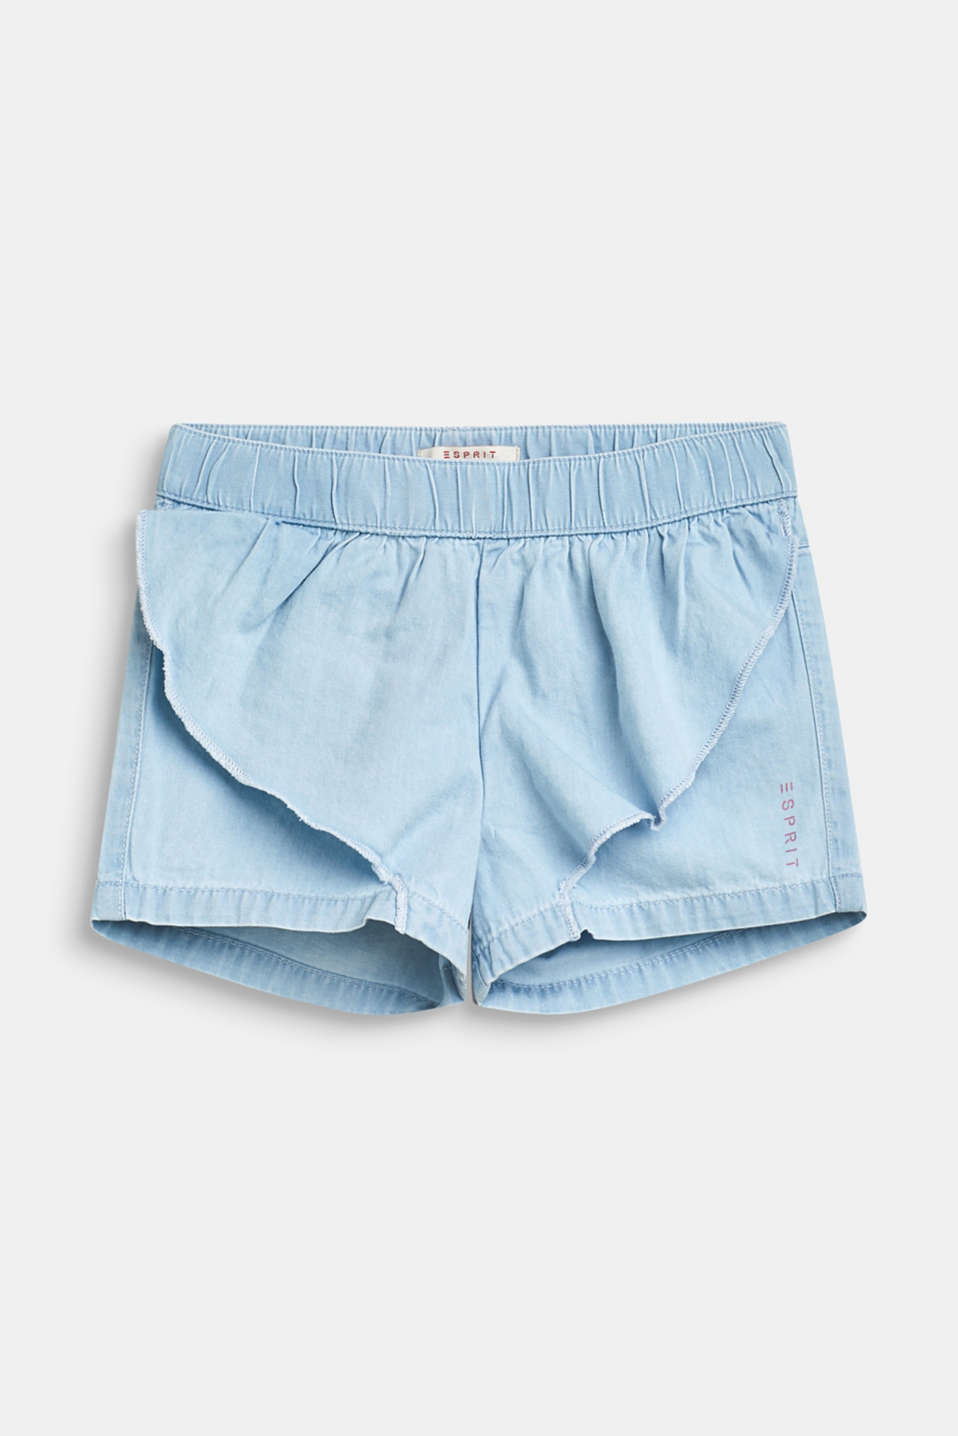 Frill detail denim shorts, 100% cotton, BLEACHED DENIM, detail image number 0